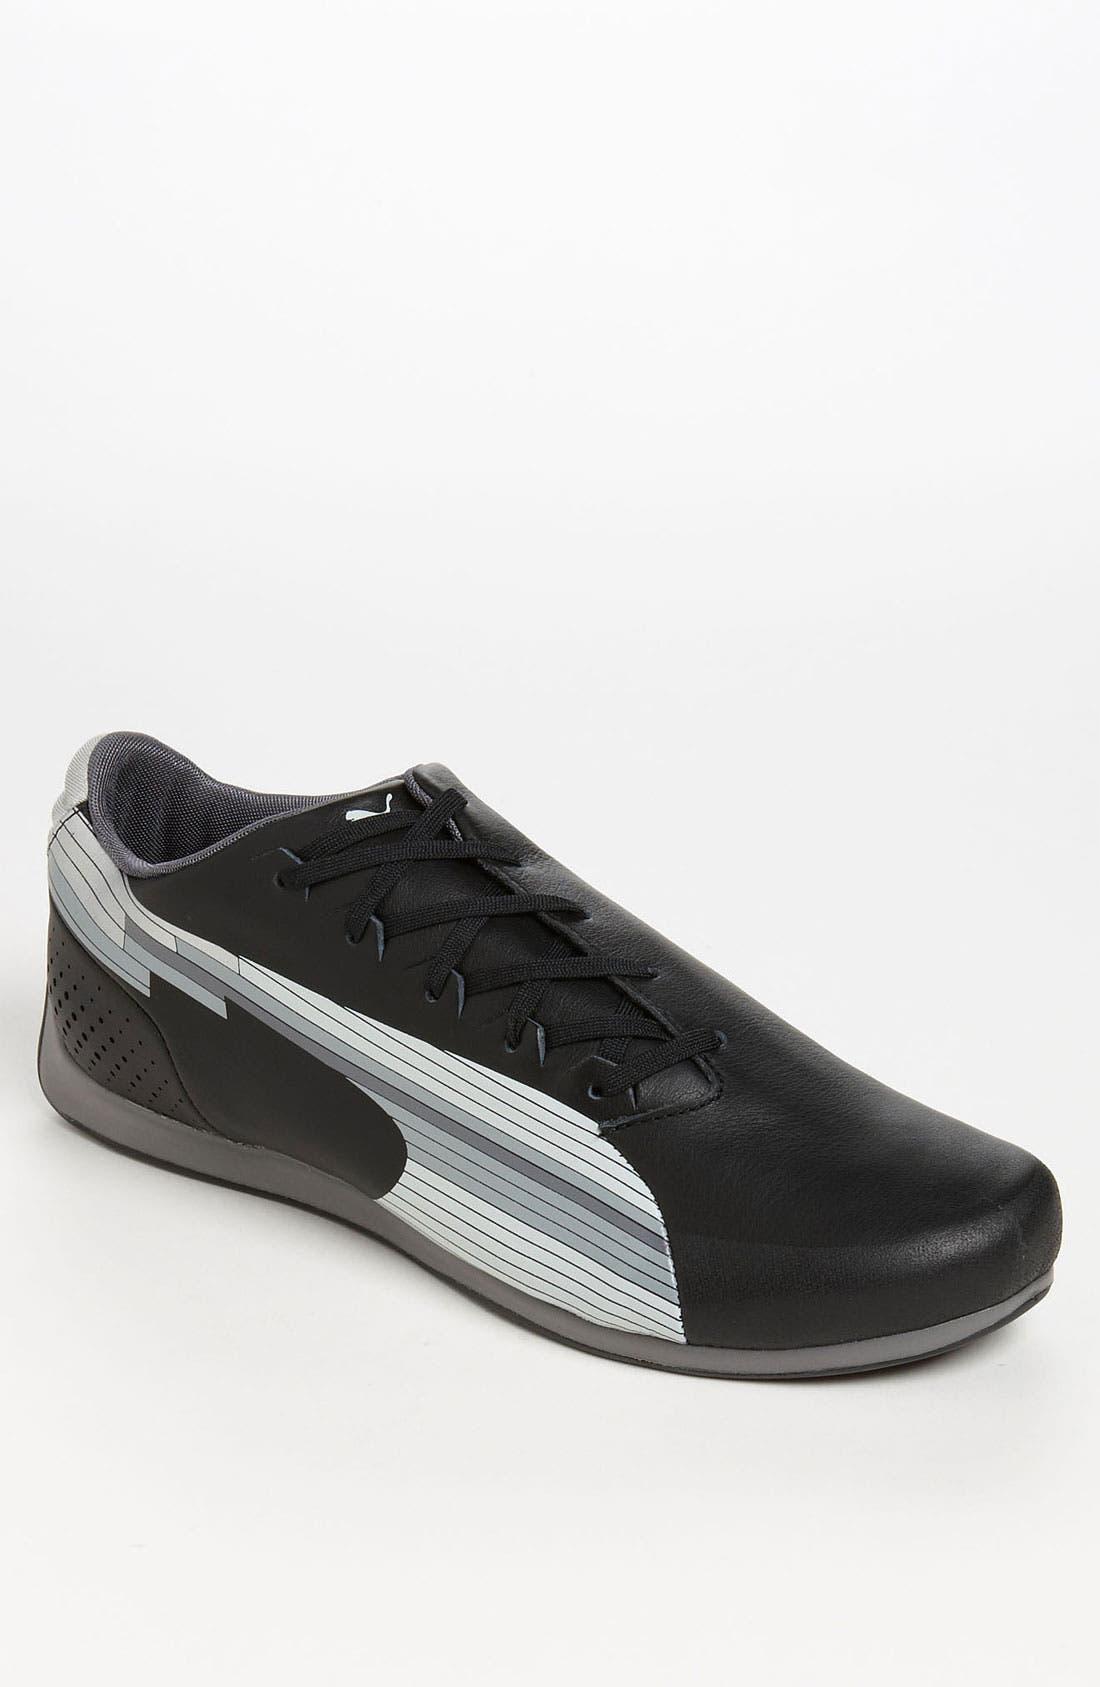 Alternate Image 1 Selected - PUMA 'evoSPEED F1' Sneaker (Men)